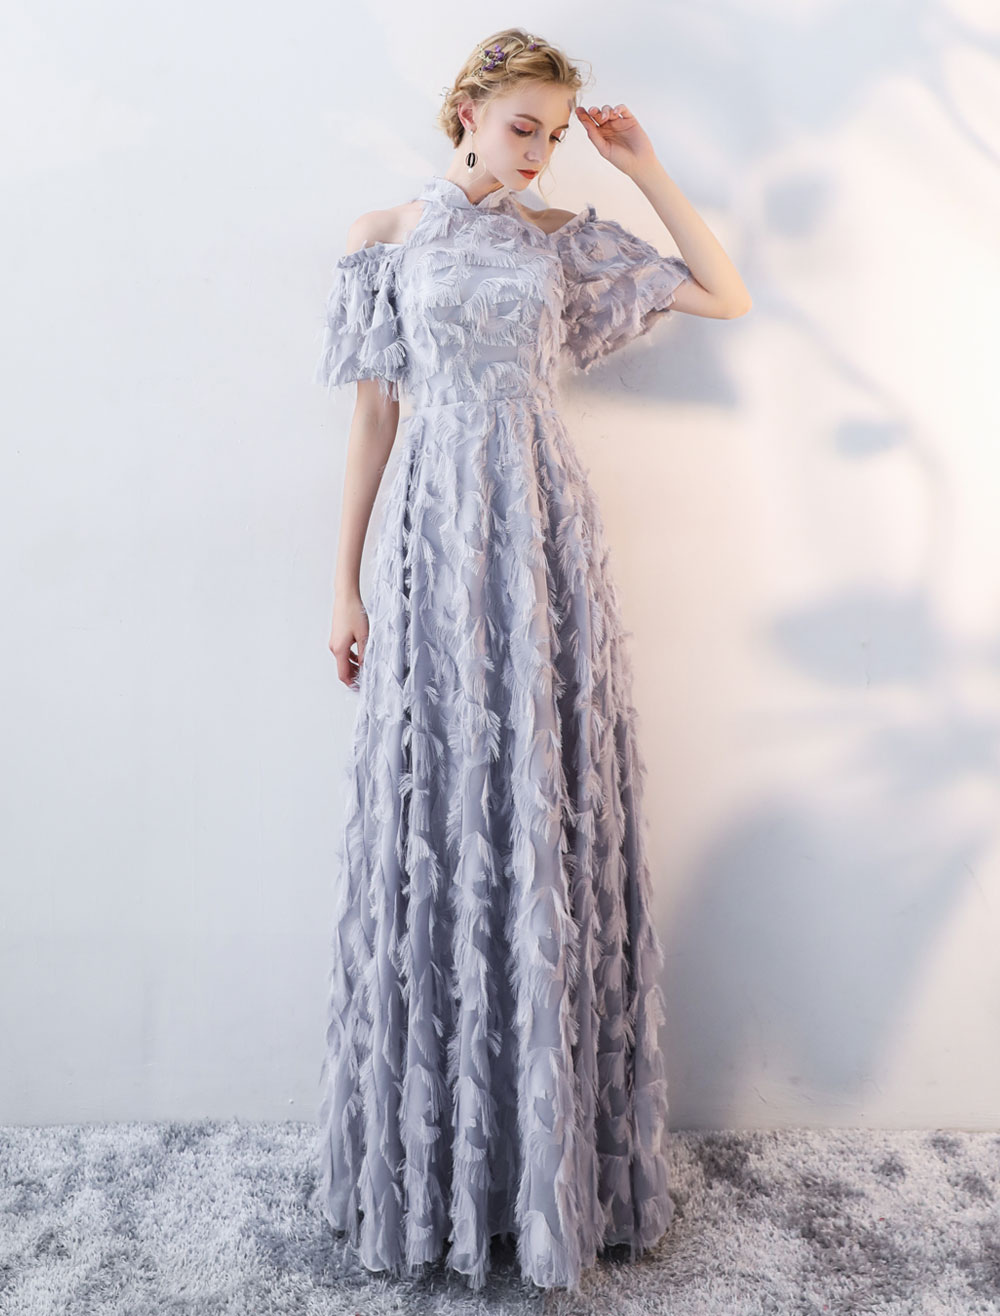 Prom Dresses Long Light Grey Cold Shoulder Evening Dress Lace Stand Collar Floor Length Formal Dress